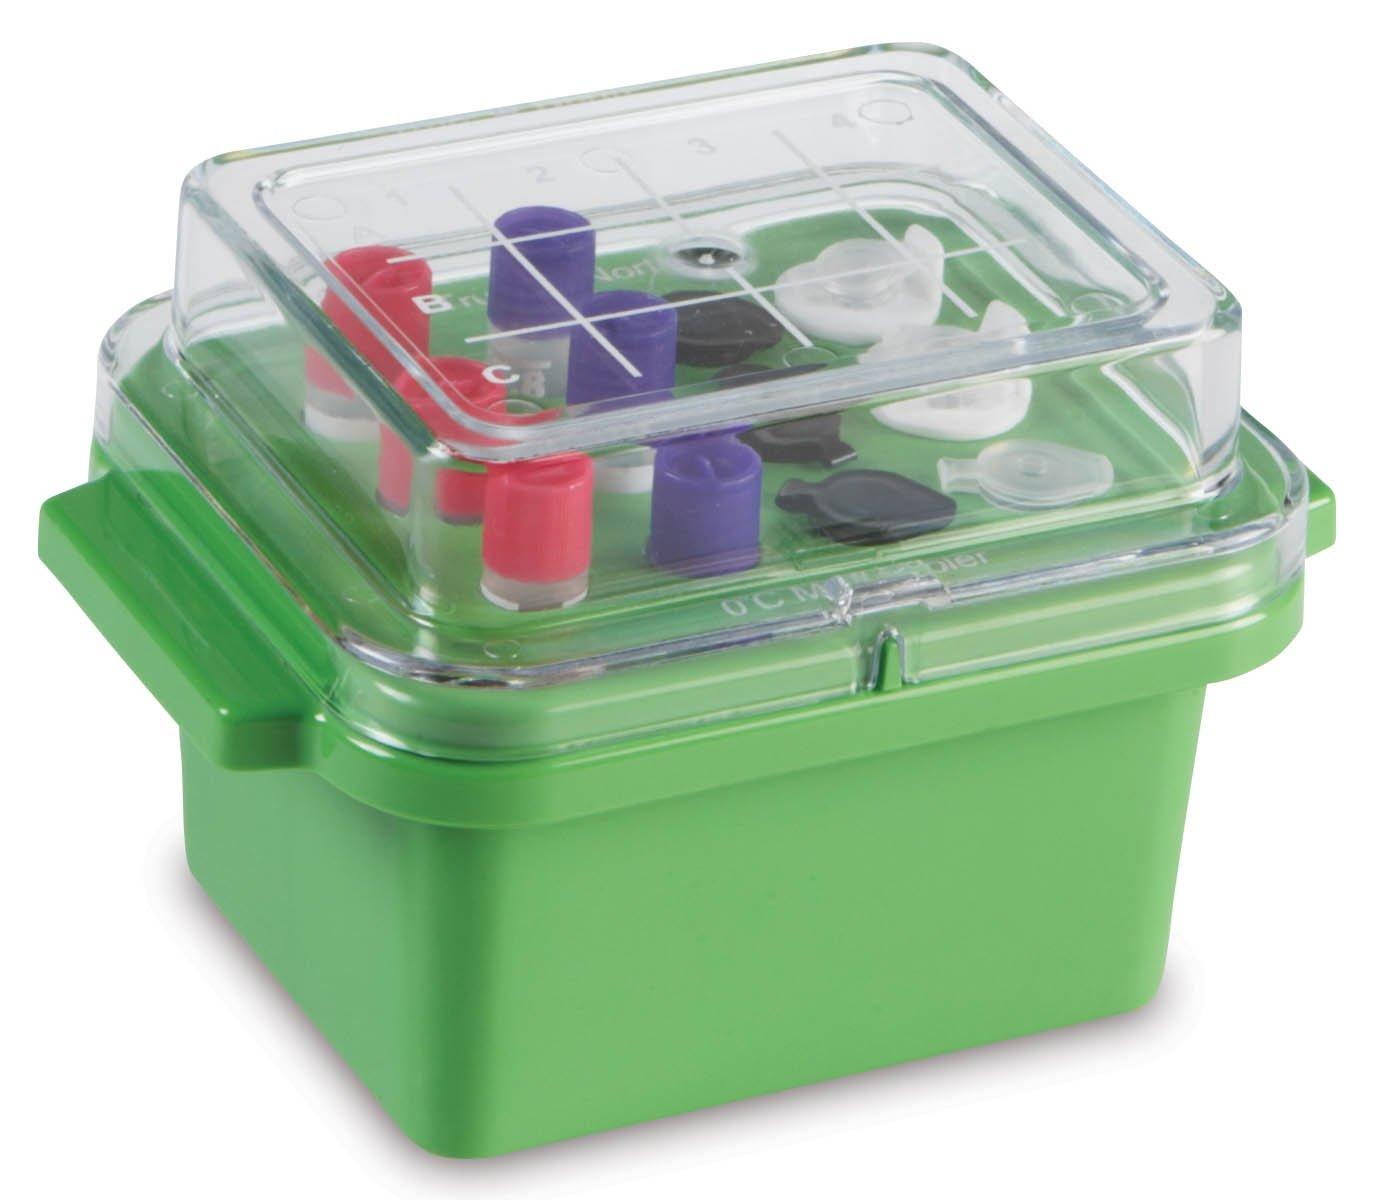 True North Green Mini Cooler 0 Degrees C - Clear Lid - 12 x 0.5-2.0 mL